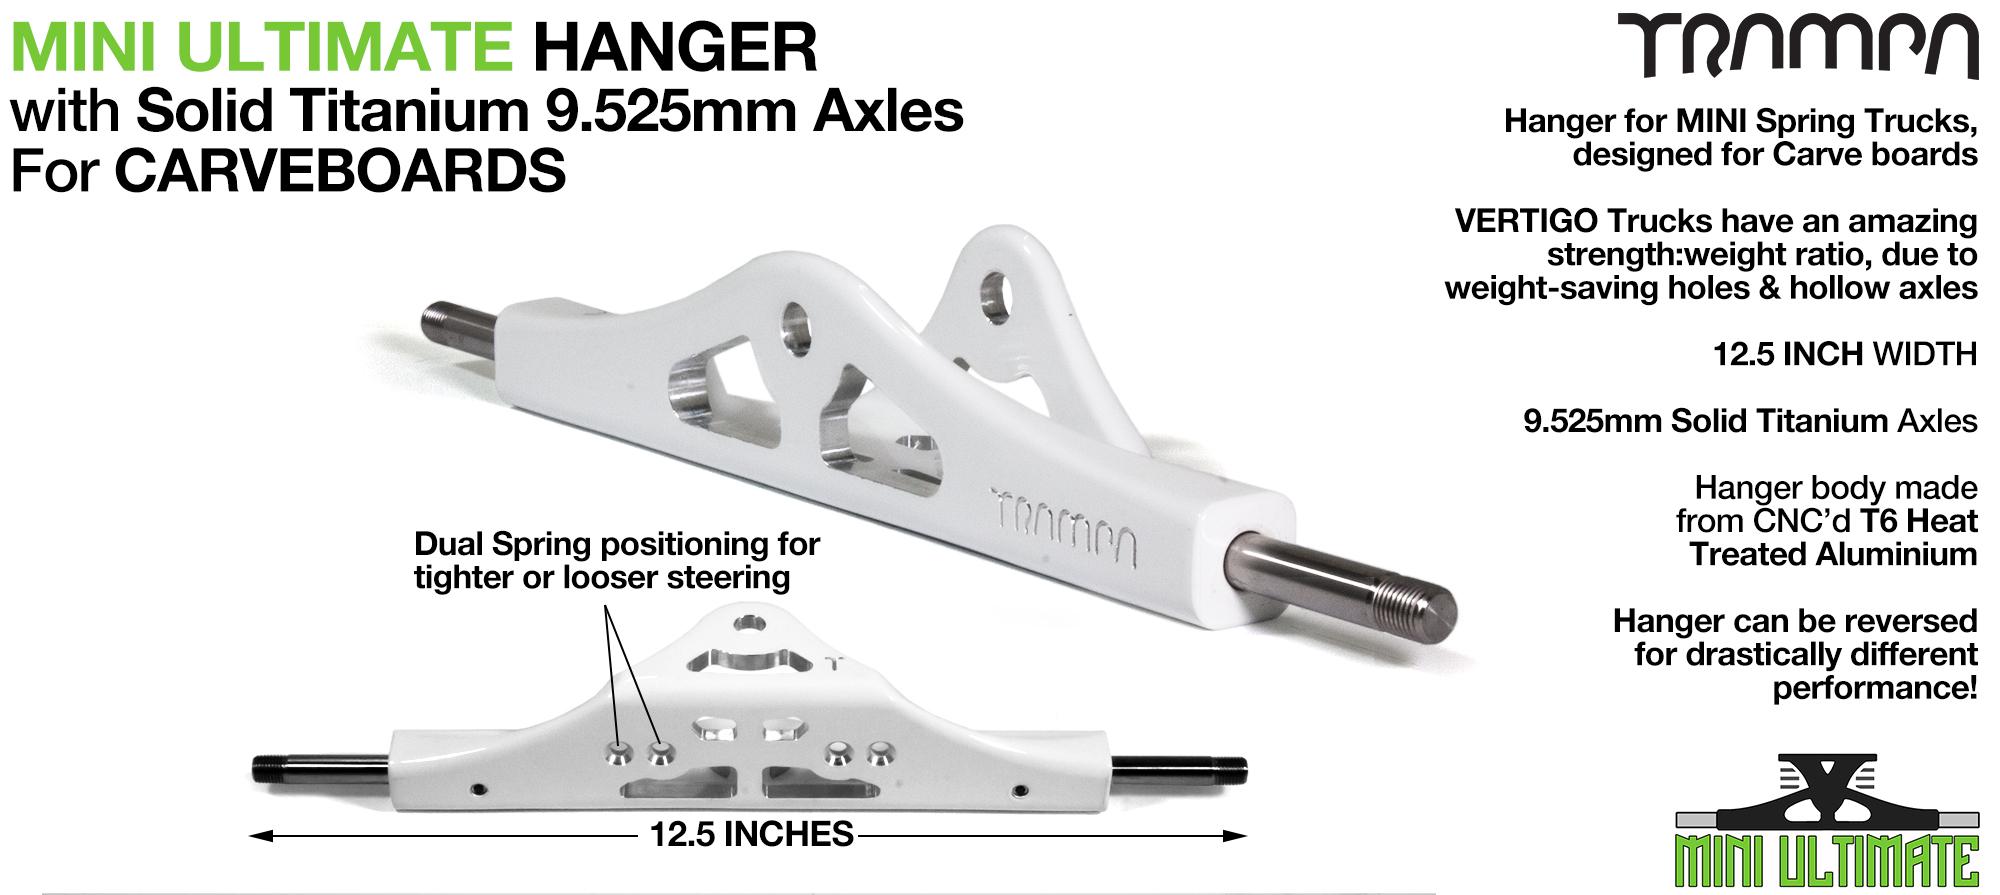 Mini ULTIMATE Hanger - 9.525mm TITANIUM Axles, Powder Coated White & CNC'd light